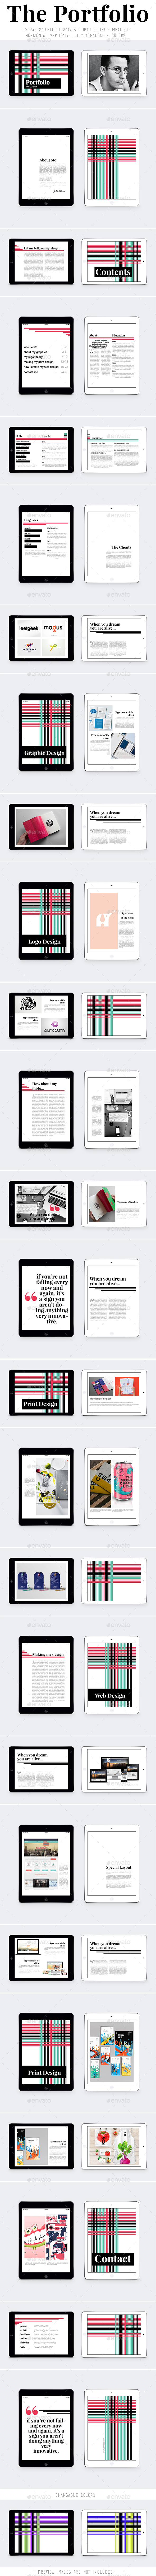 Ipad&Tablet The Portfolio - Digital Magazines ePublishing